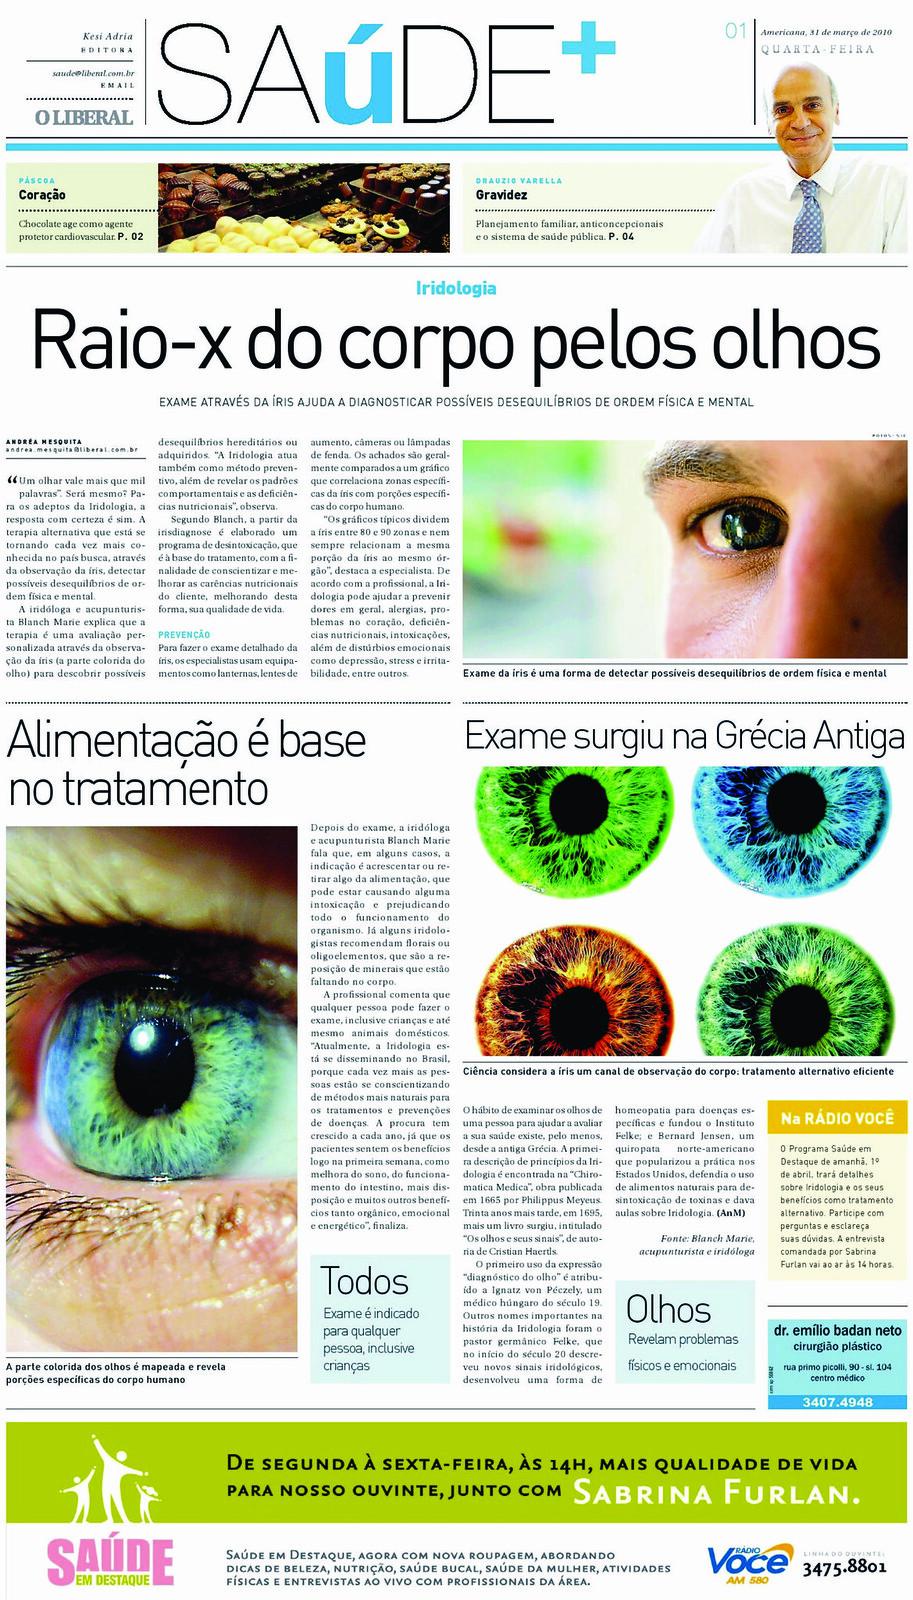 iridologia na midia;curso de iridologia, iridologia online, iridologia